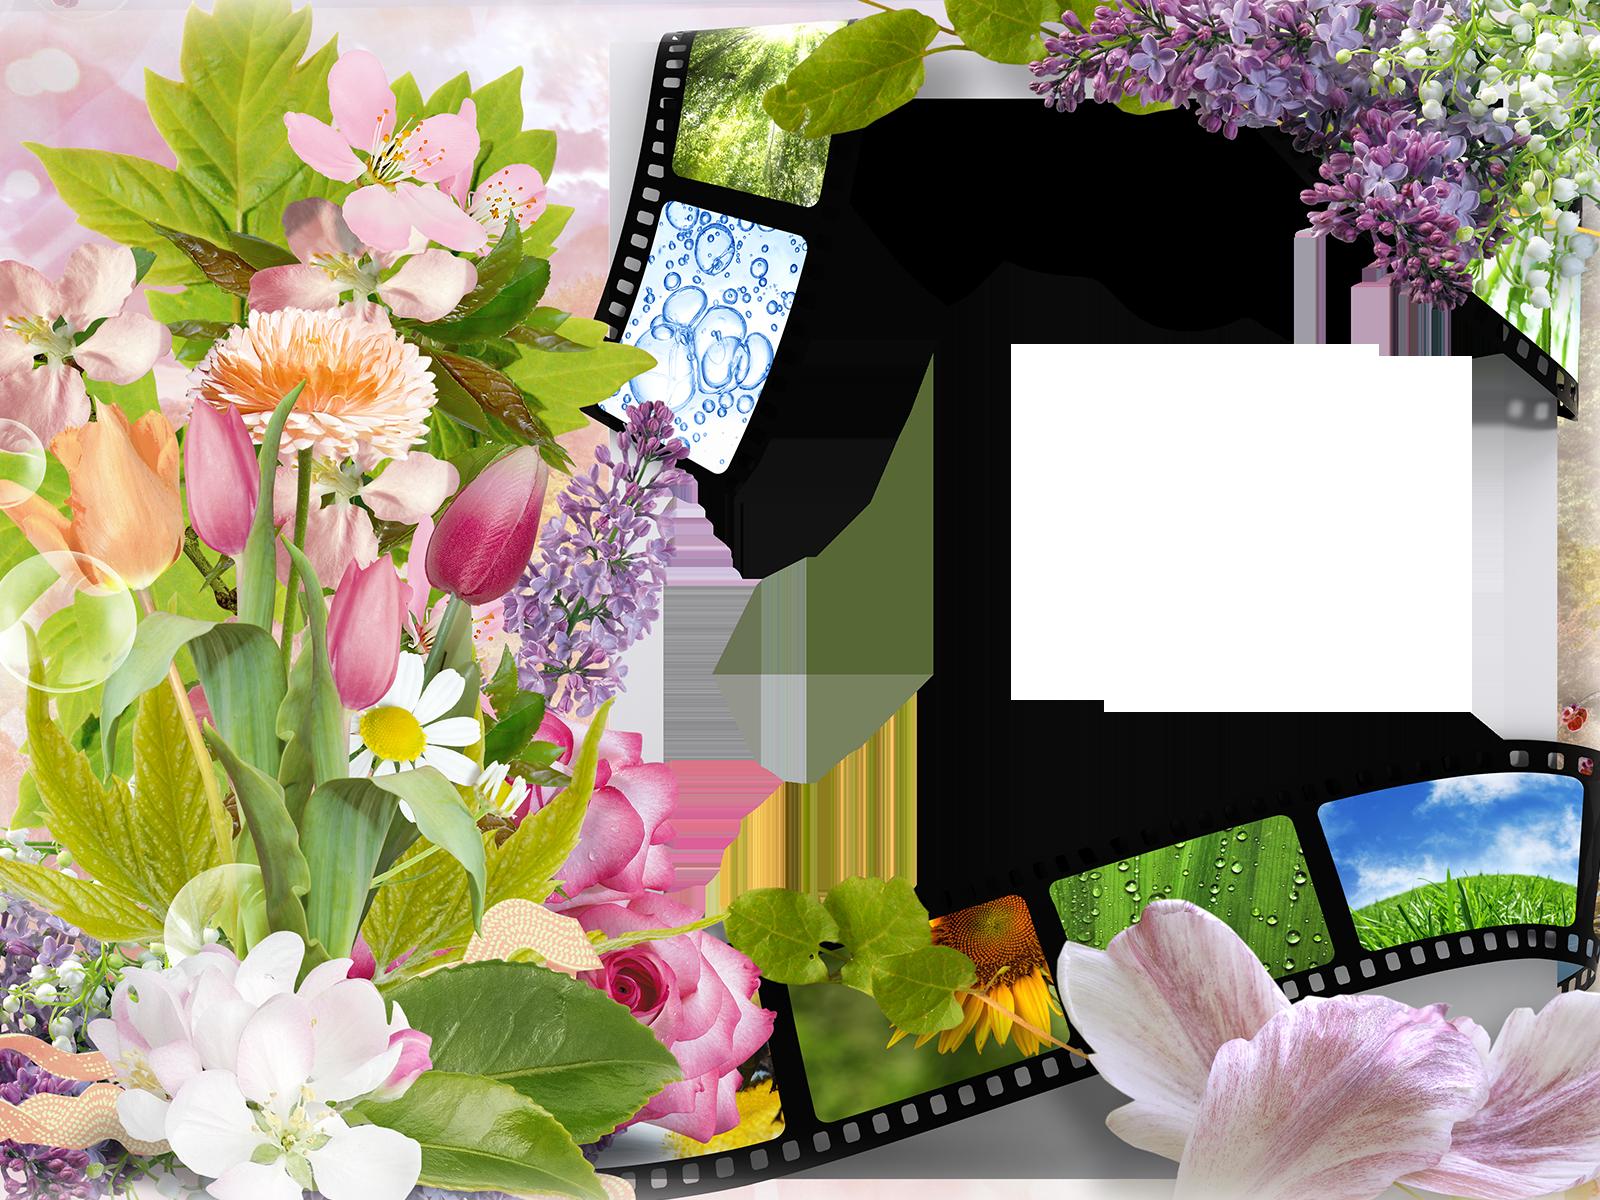 Фотомонтаж и фоторамки с цветами